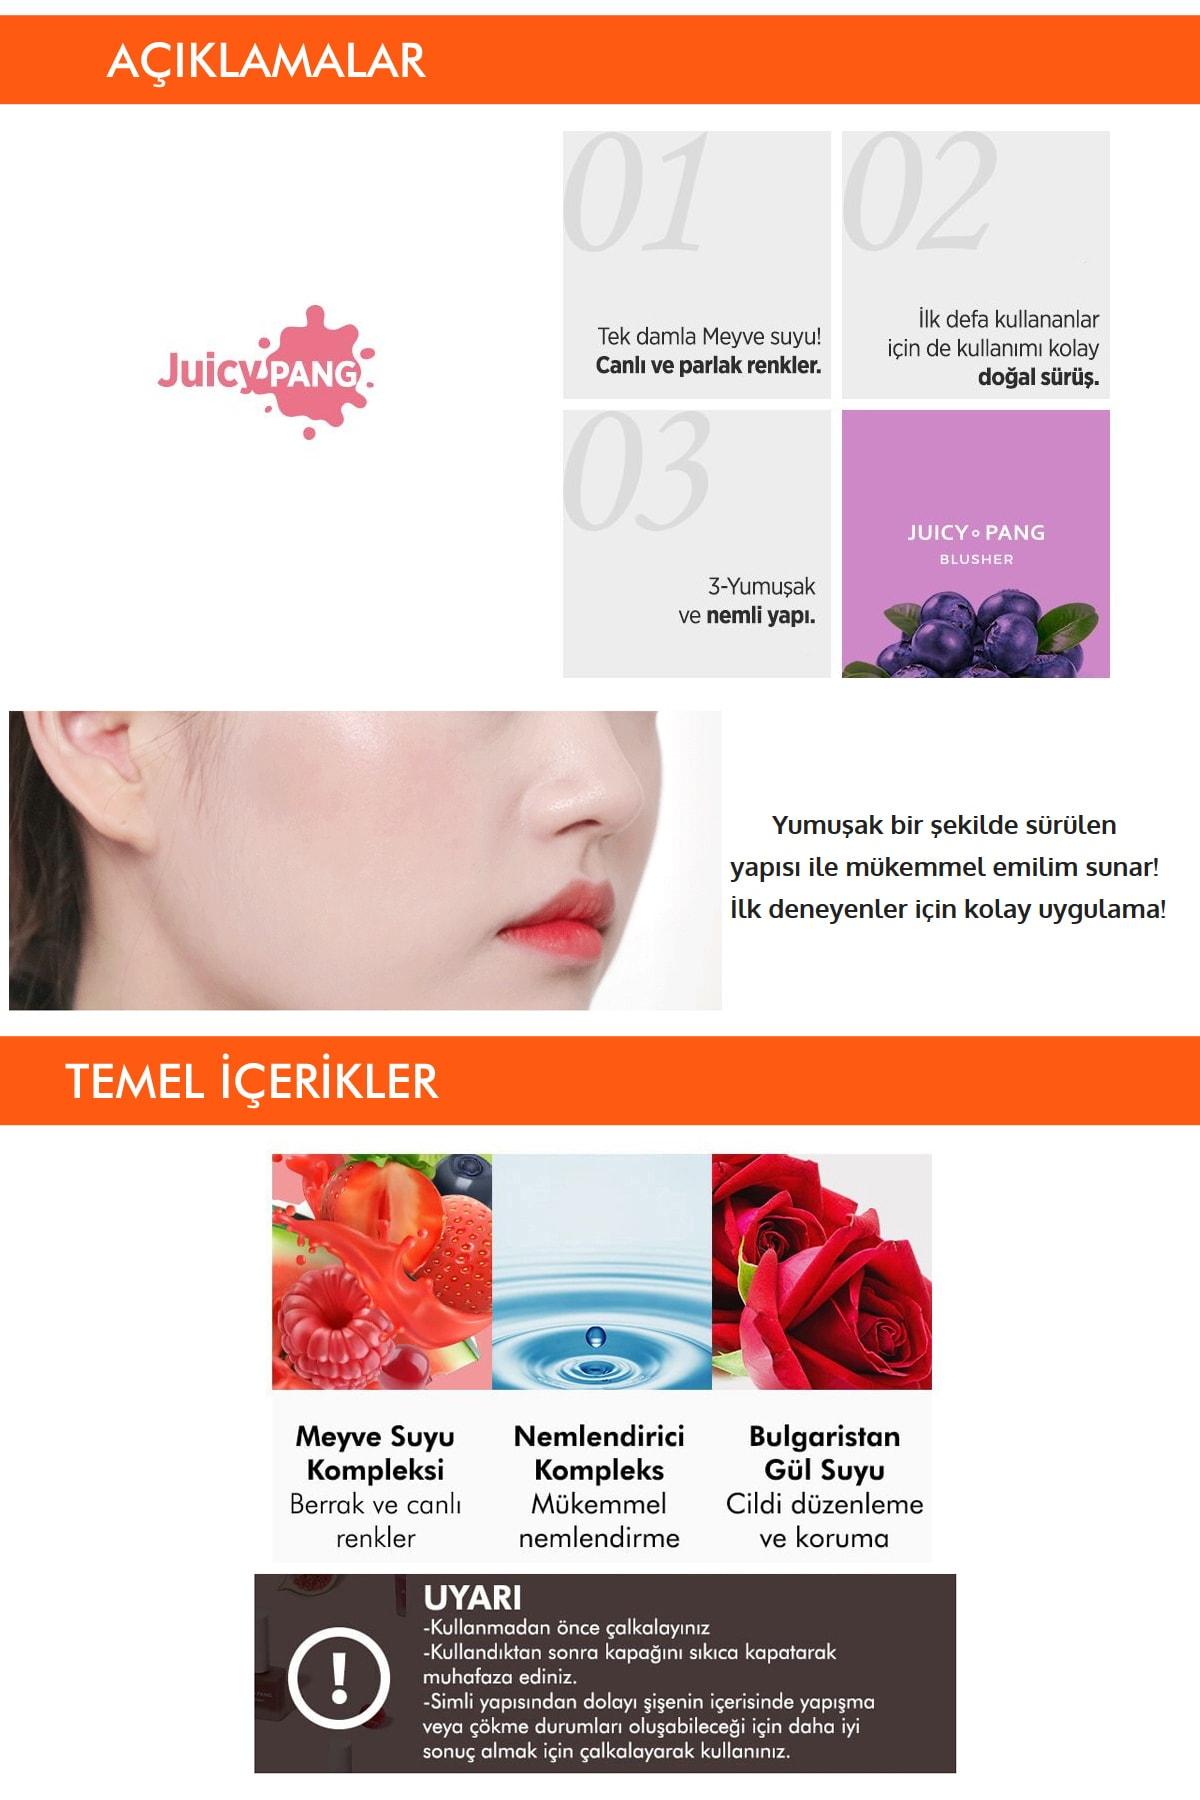 Missha Doğal Görünüm Sunan Nemlendirici Likit Allık 9g. APIEU Juicy-Pang Water Blusher (VL02) 3